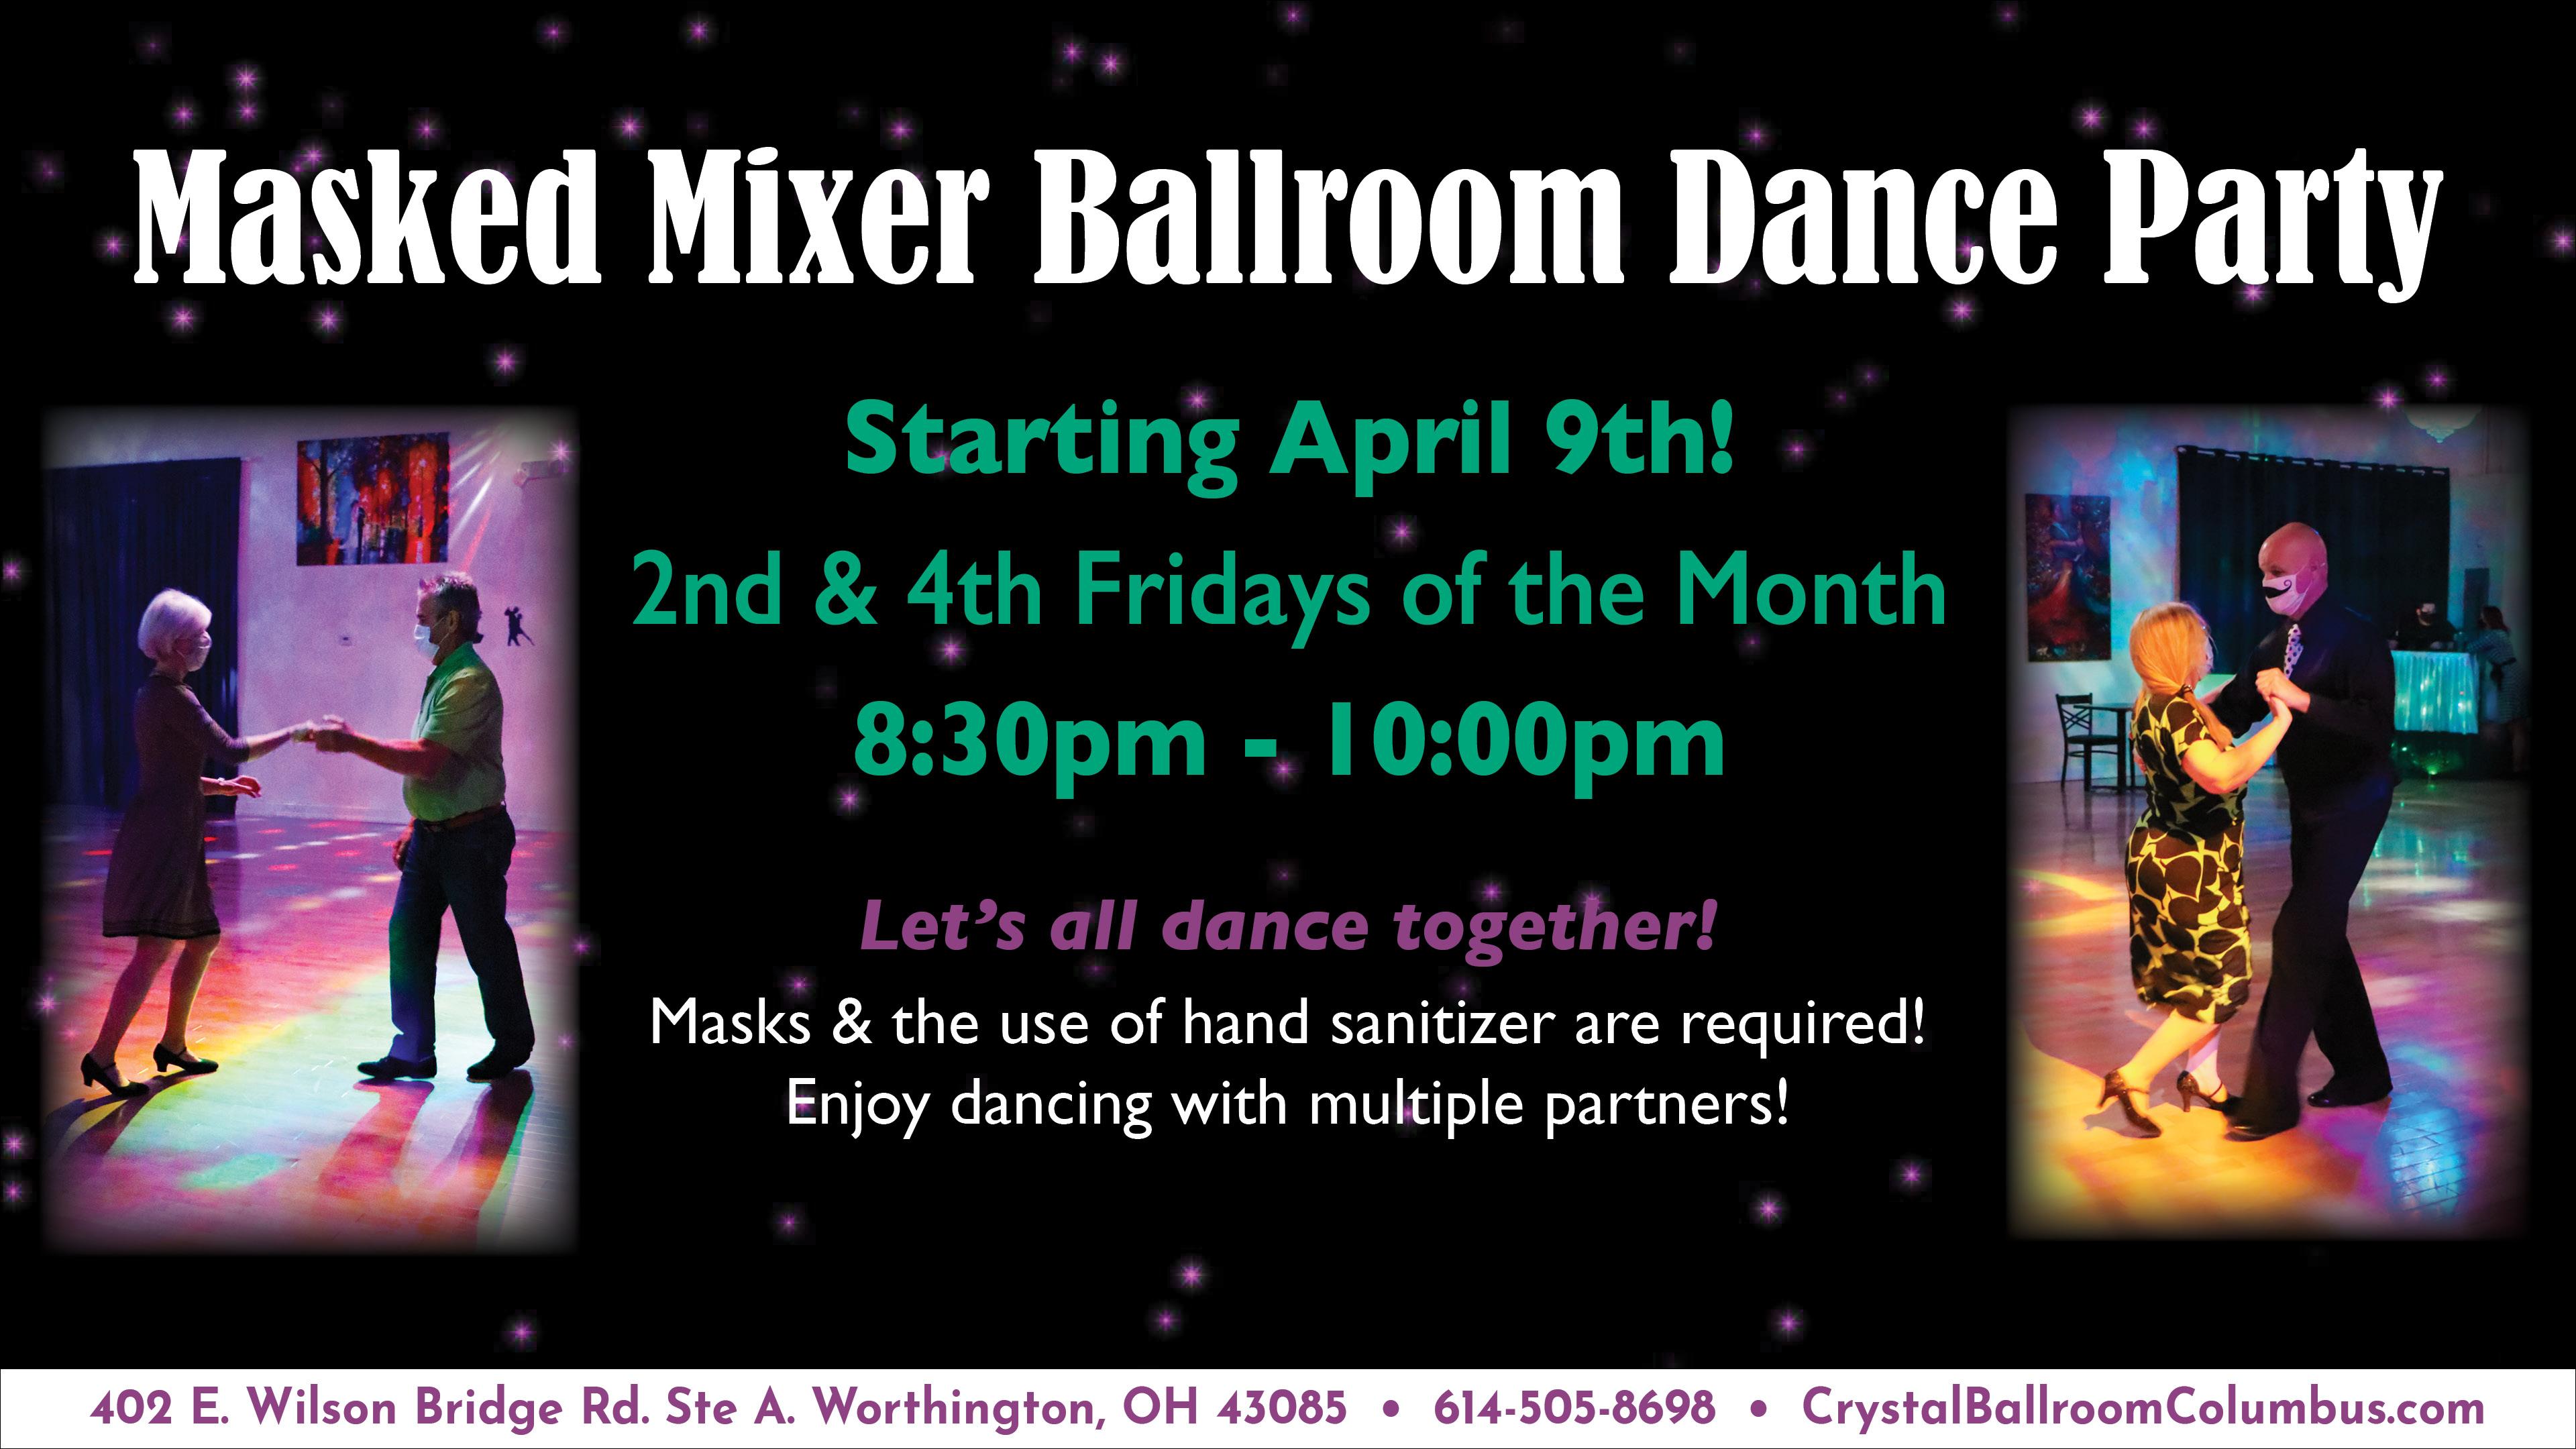 Masked Mixer Ballroom Dance Party